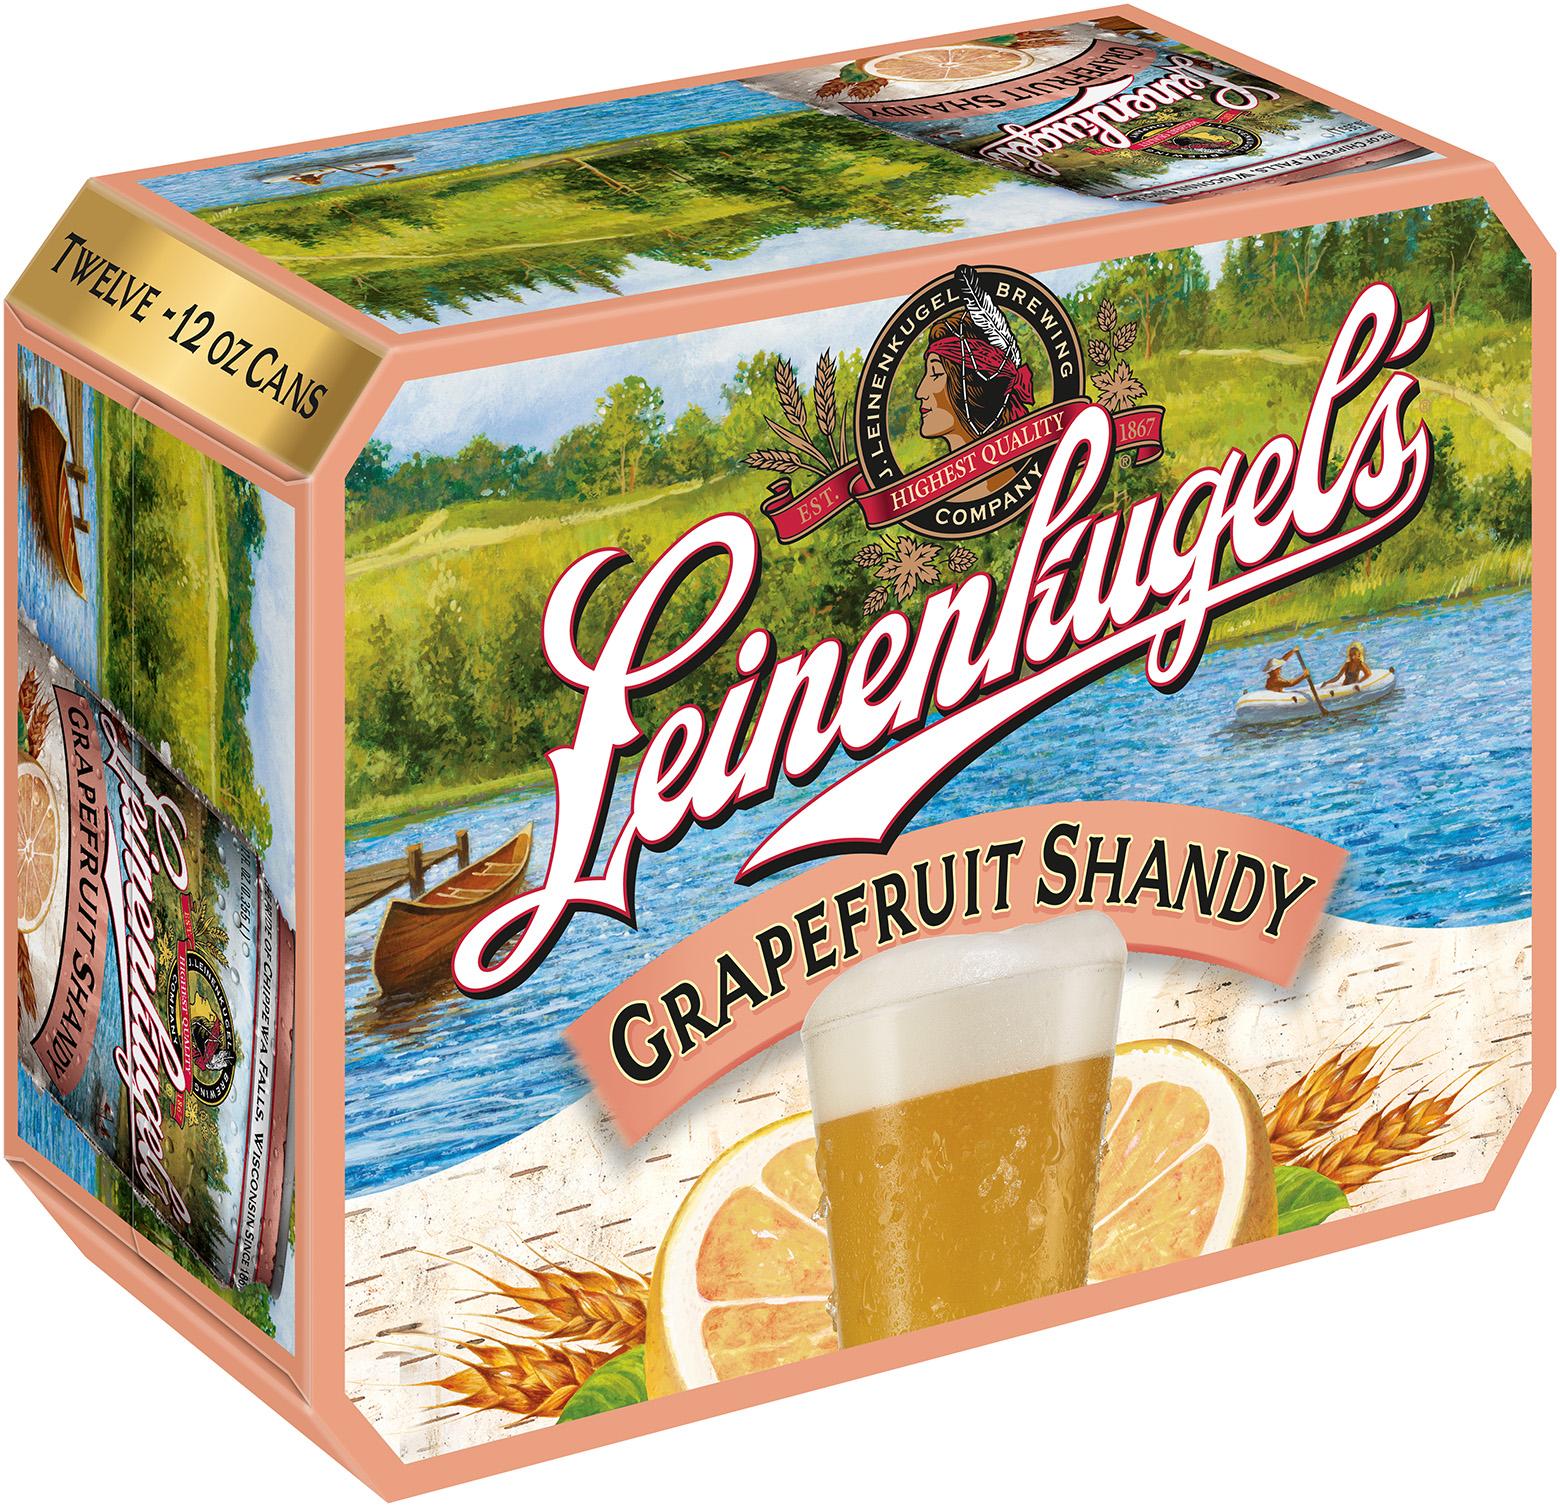 Leinenkugel's Grapefruit Shandy Beer